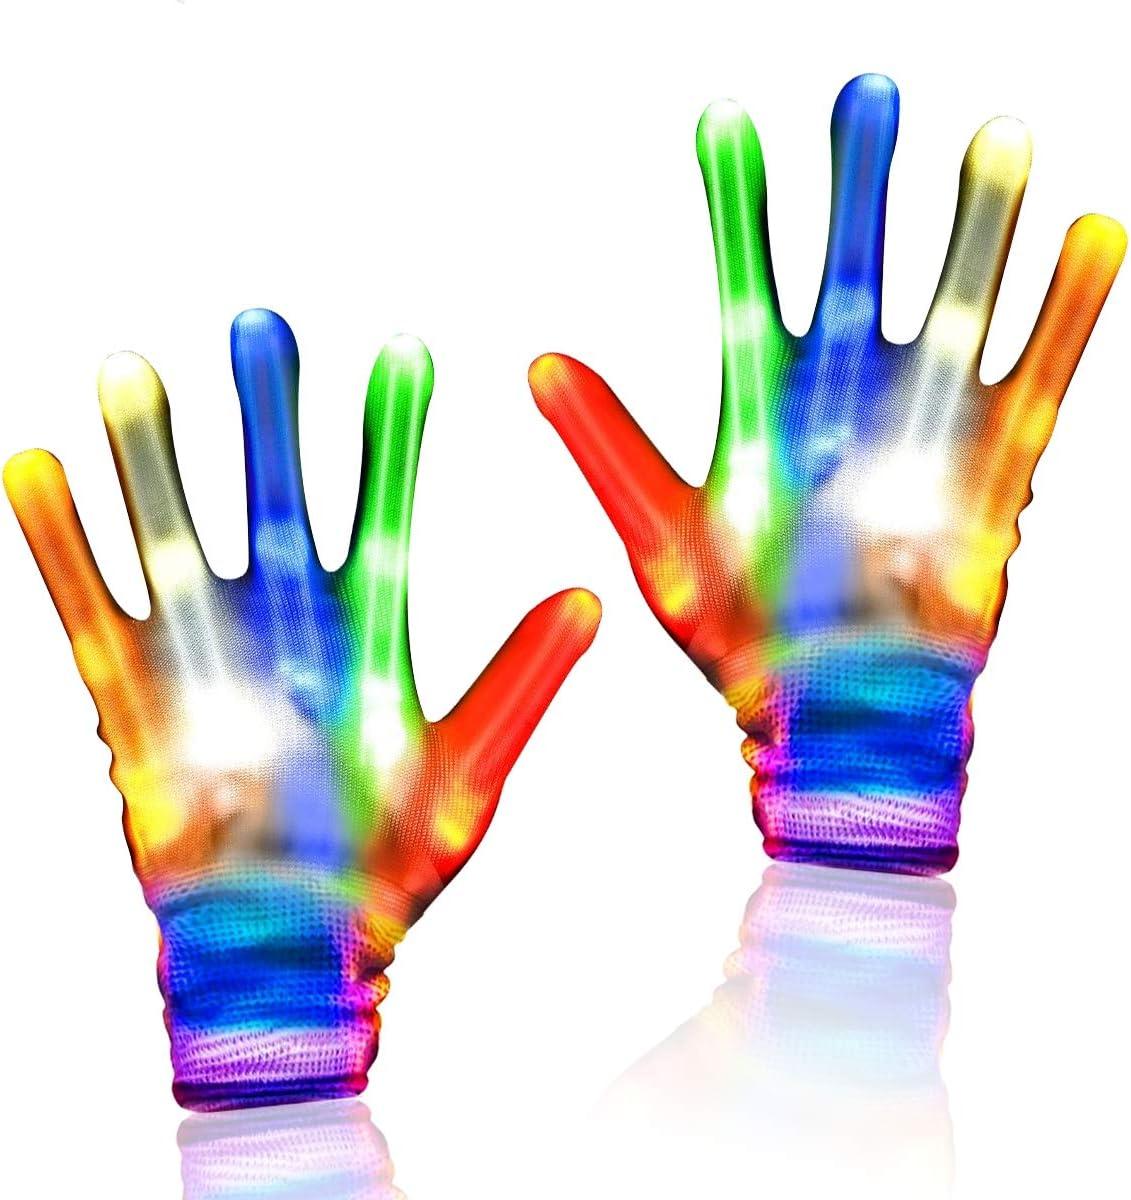 Led Party Gloves Light Rave Finger Lighting Halloween Flashing Dance Electro Up